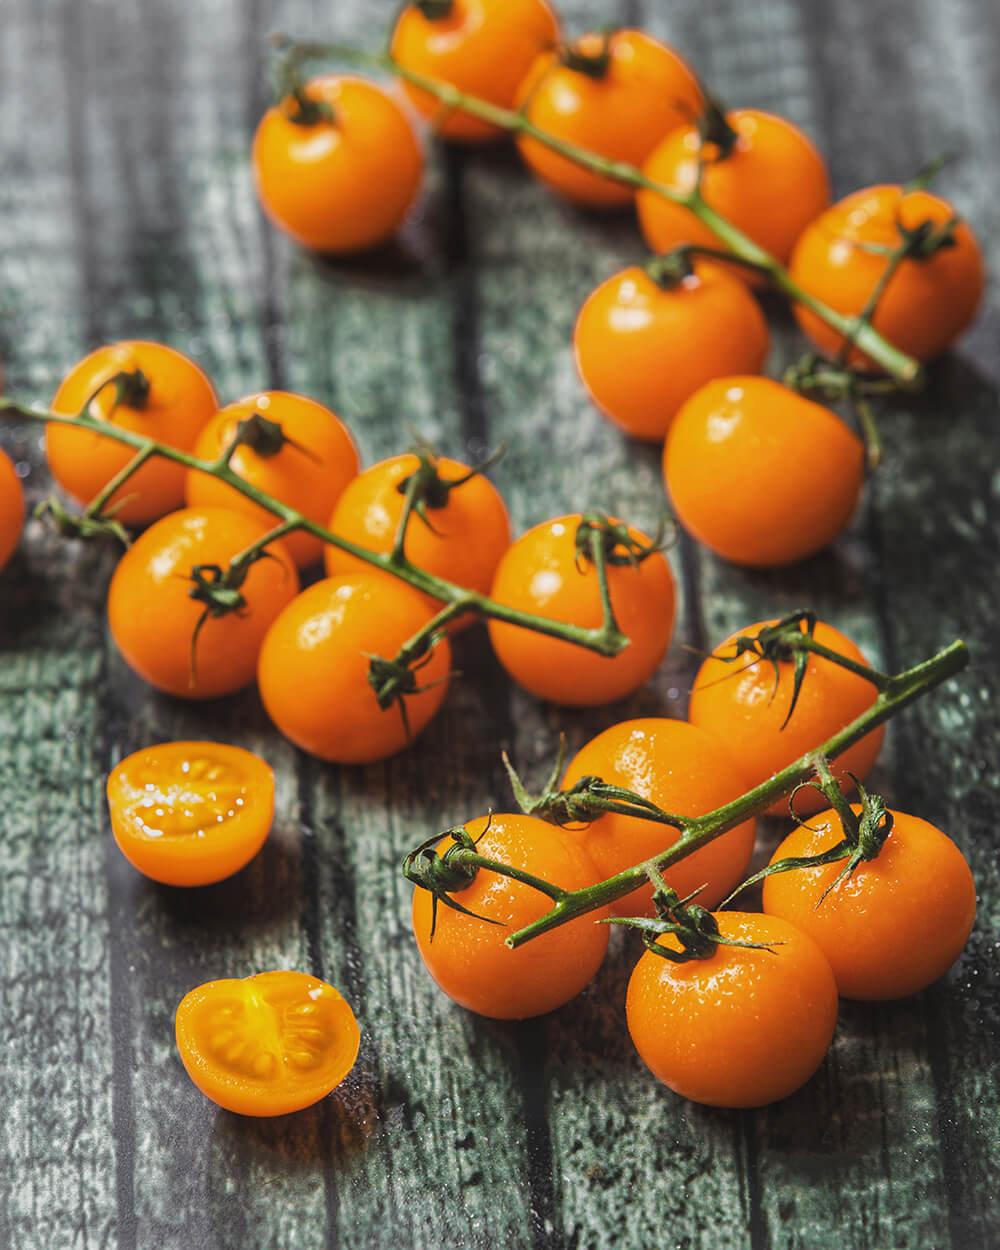 Golden Orange Tomatoes Netherlands